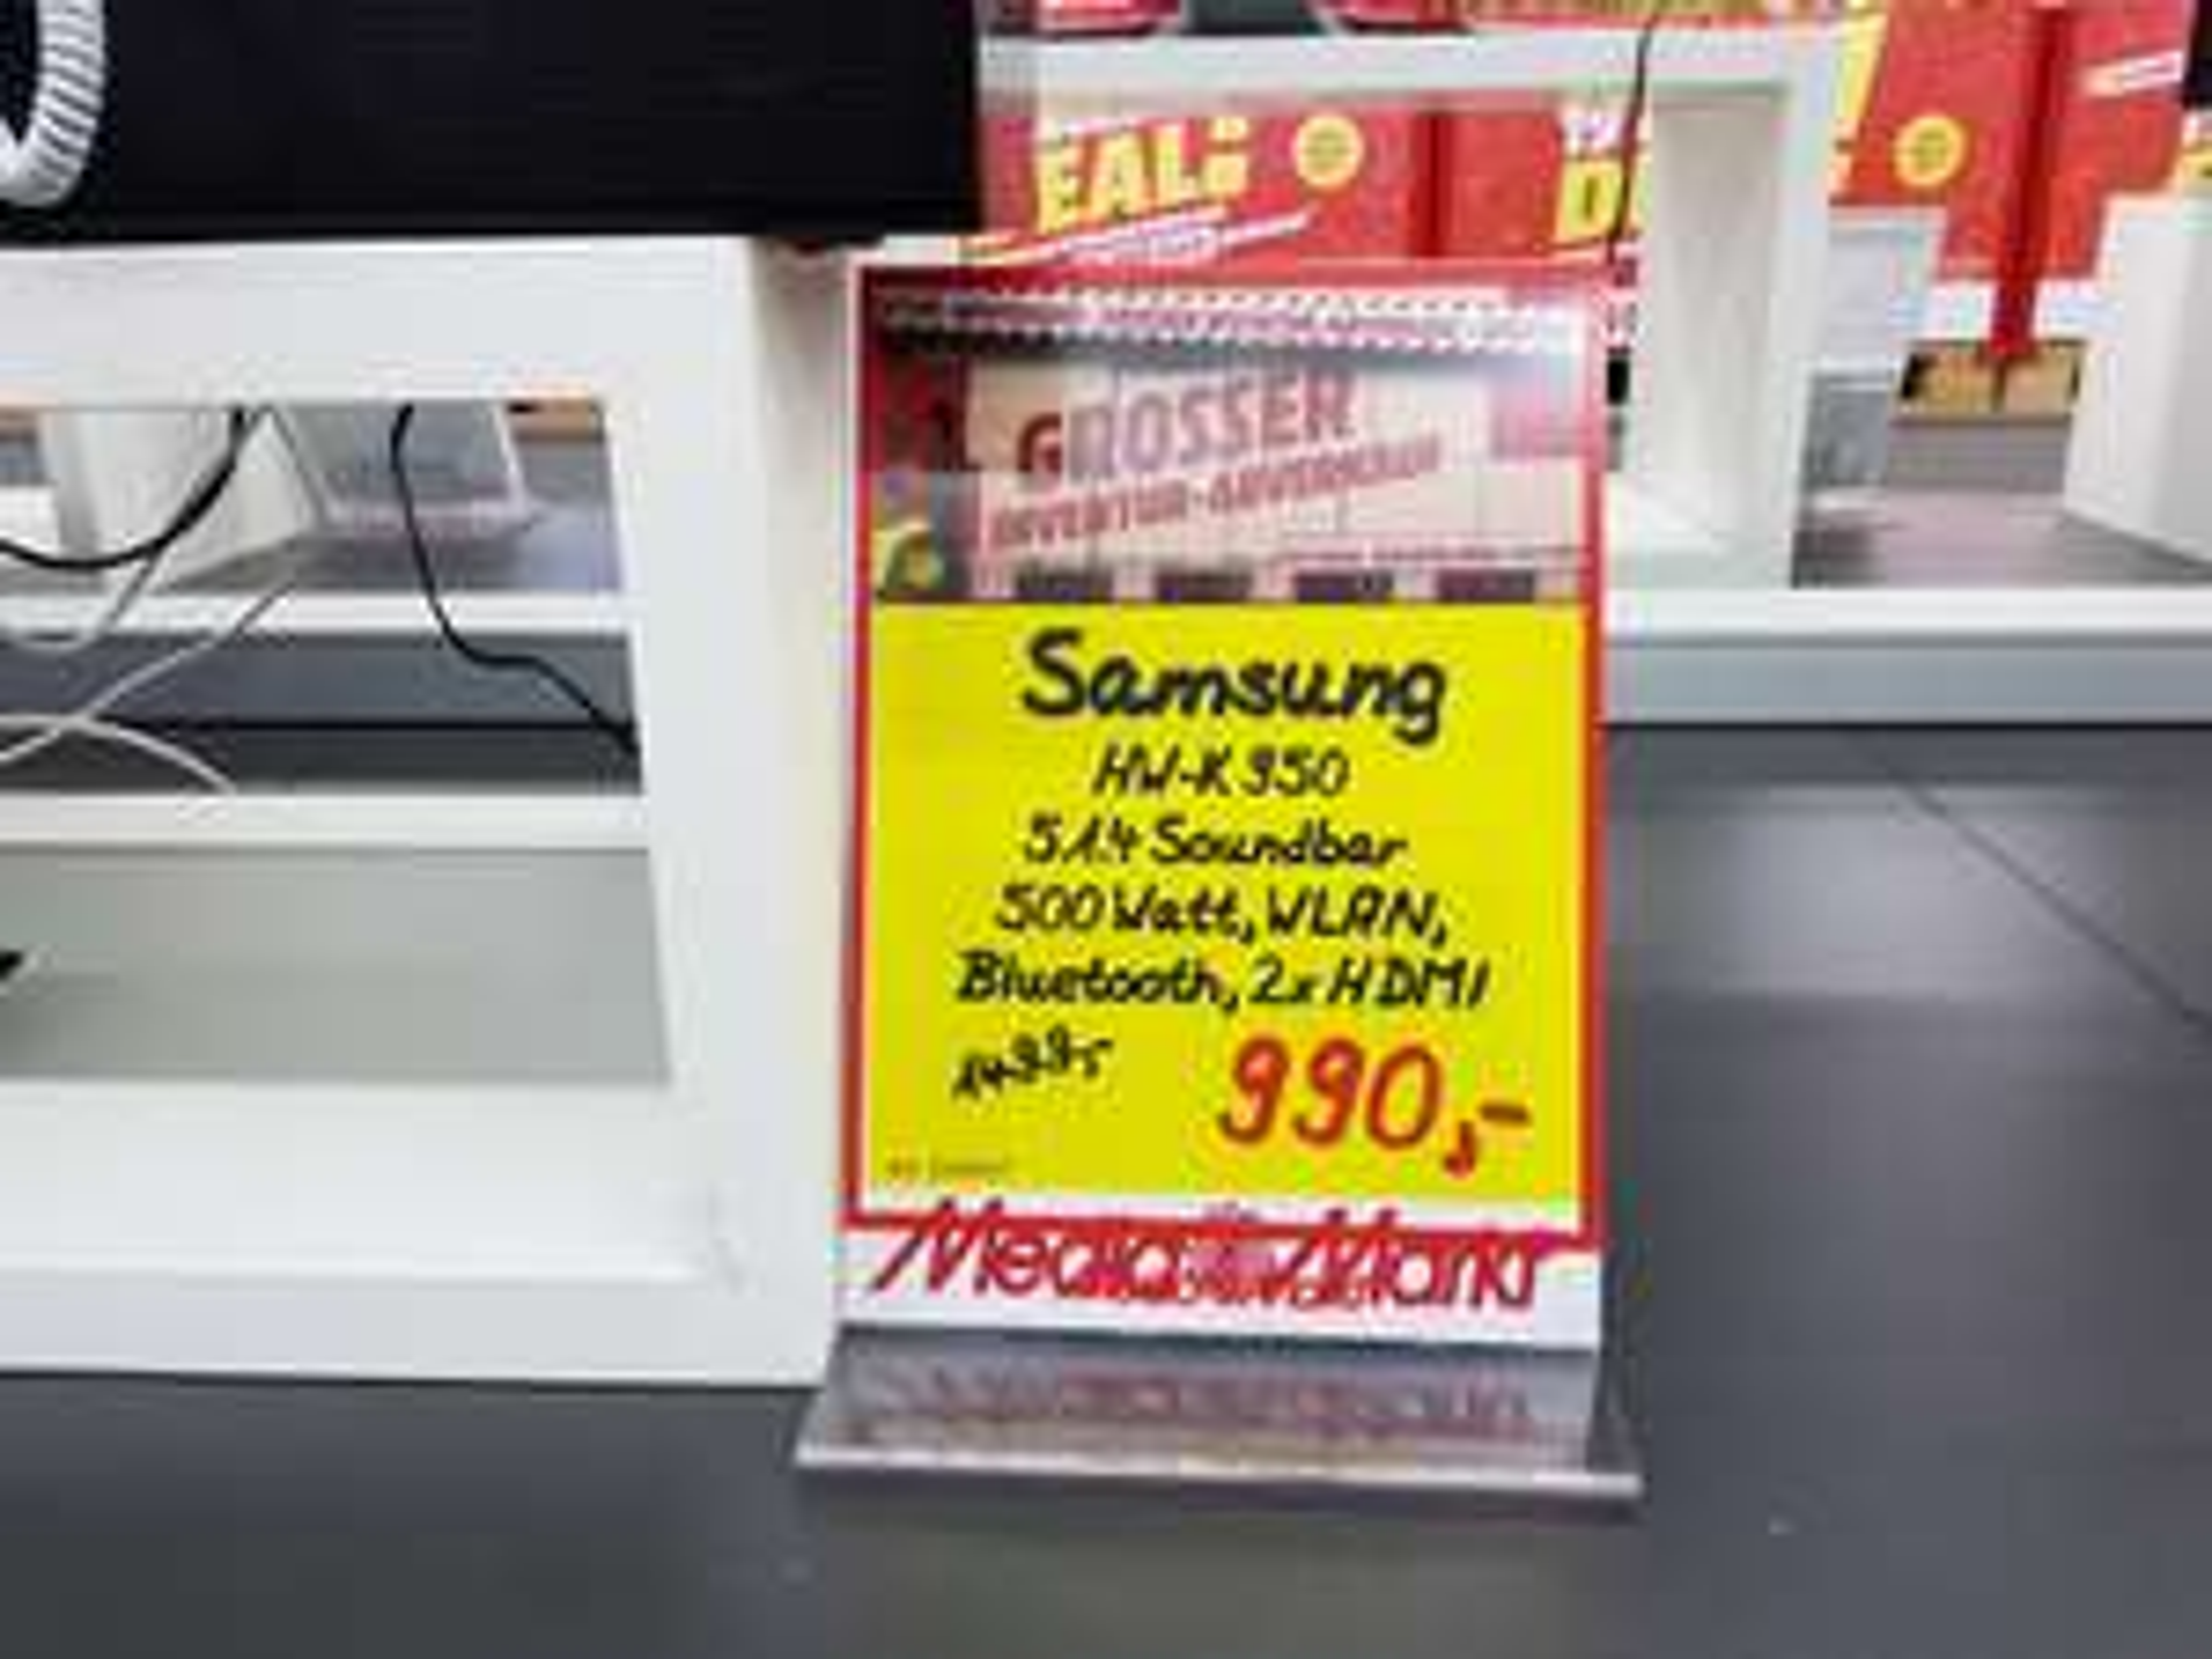 [LOKAL GÜTERSLOH] Media Markt - Samsung Dolby Atmos HW-K 950 für 990 €